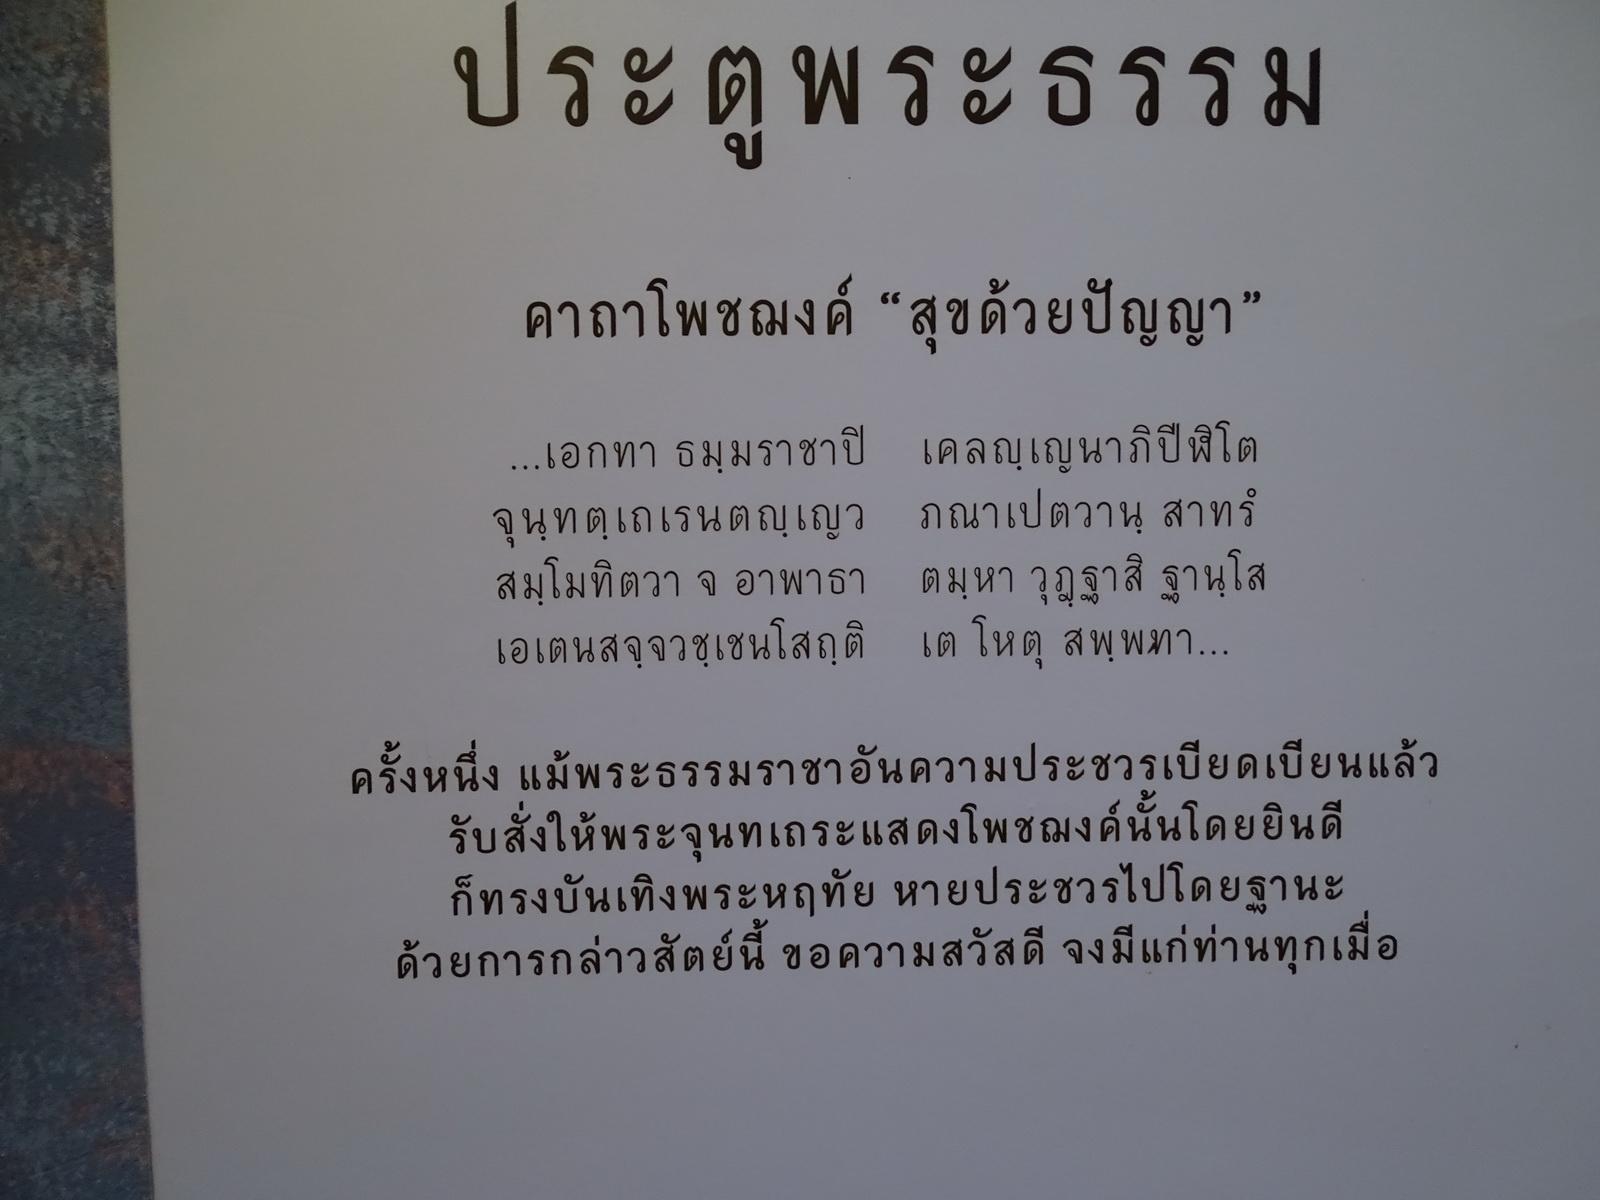 04-wat-baan-rai-038